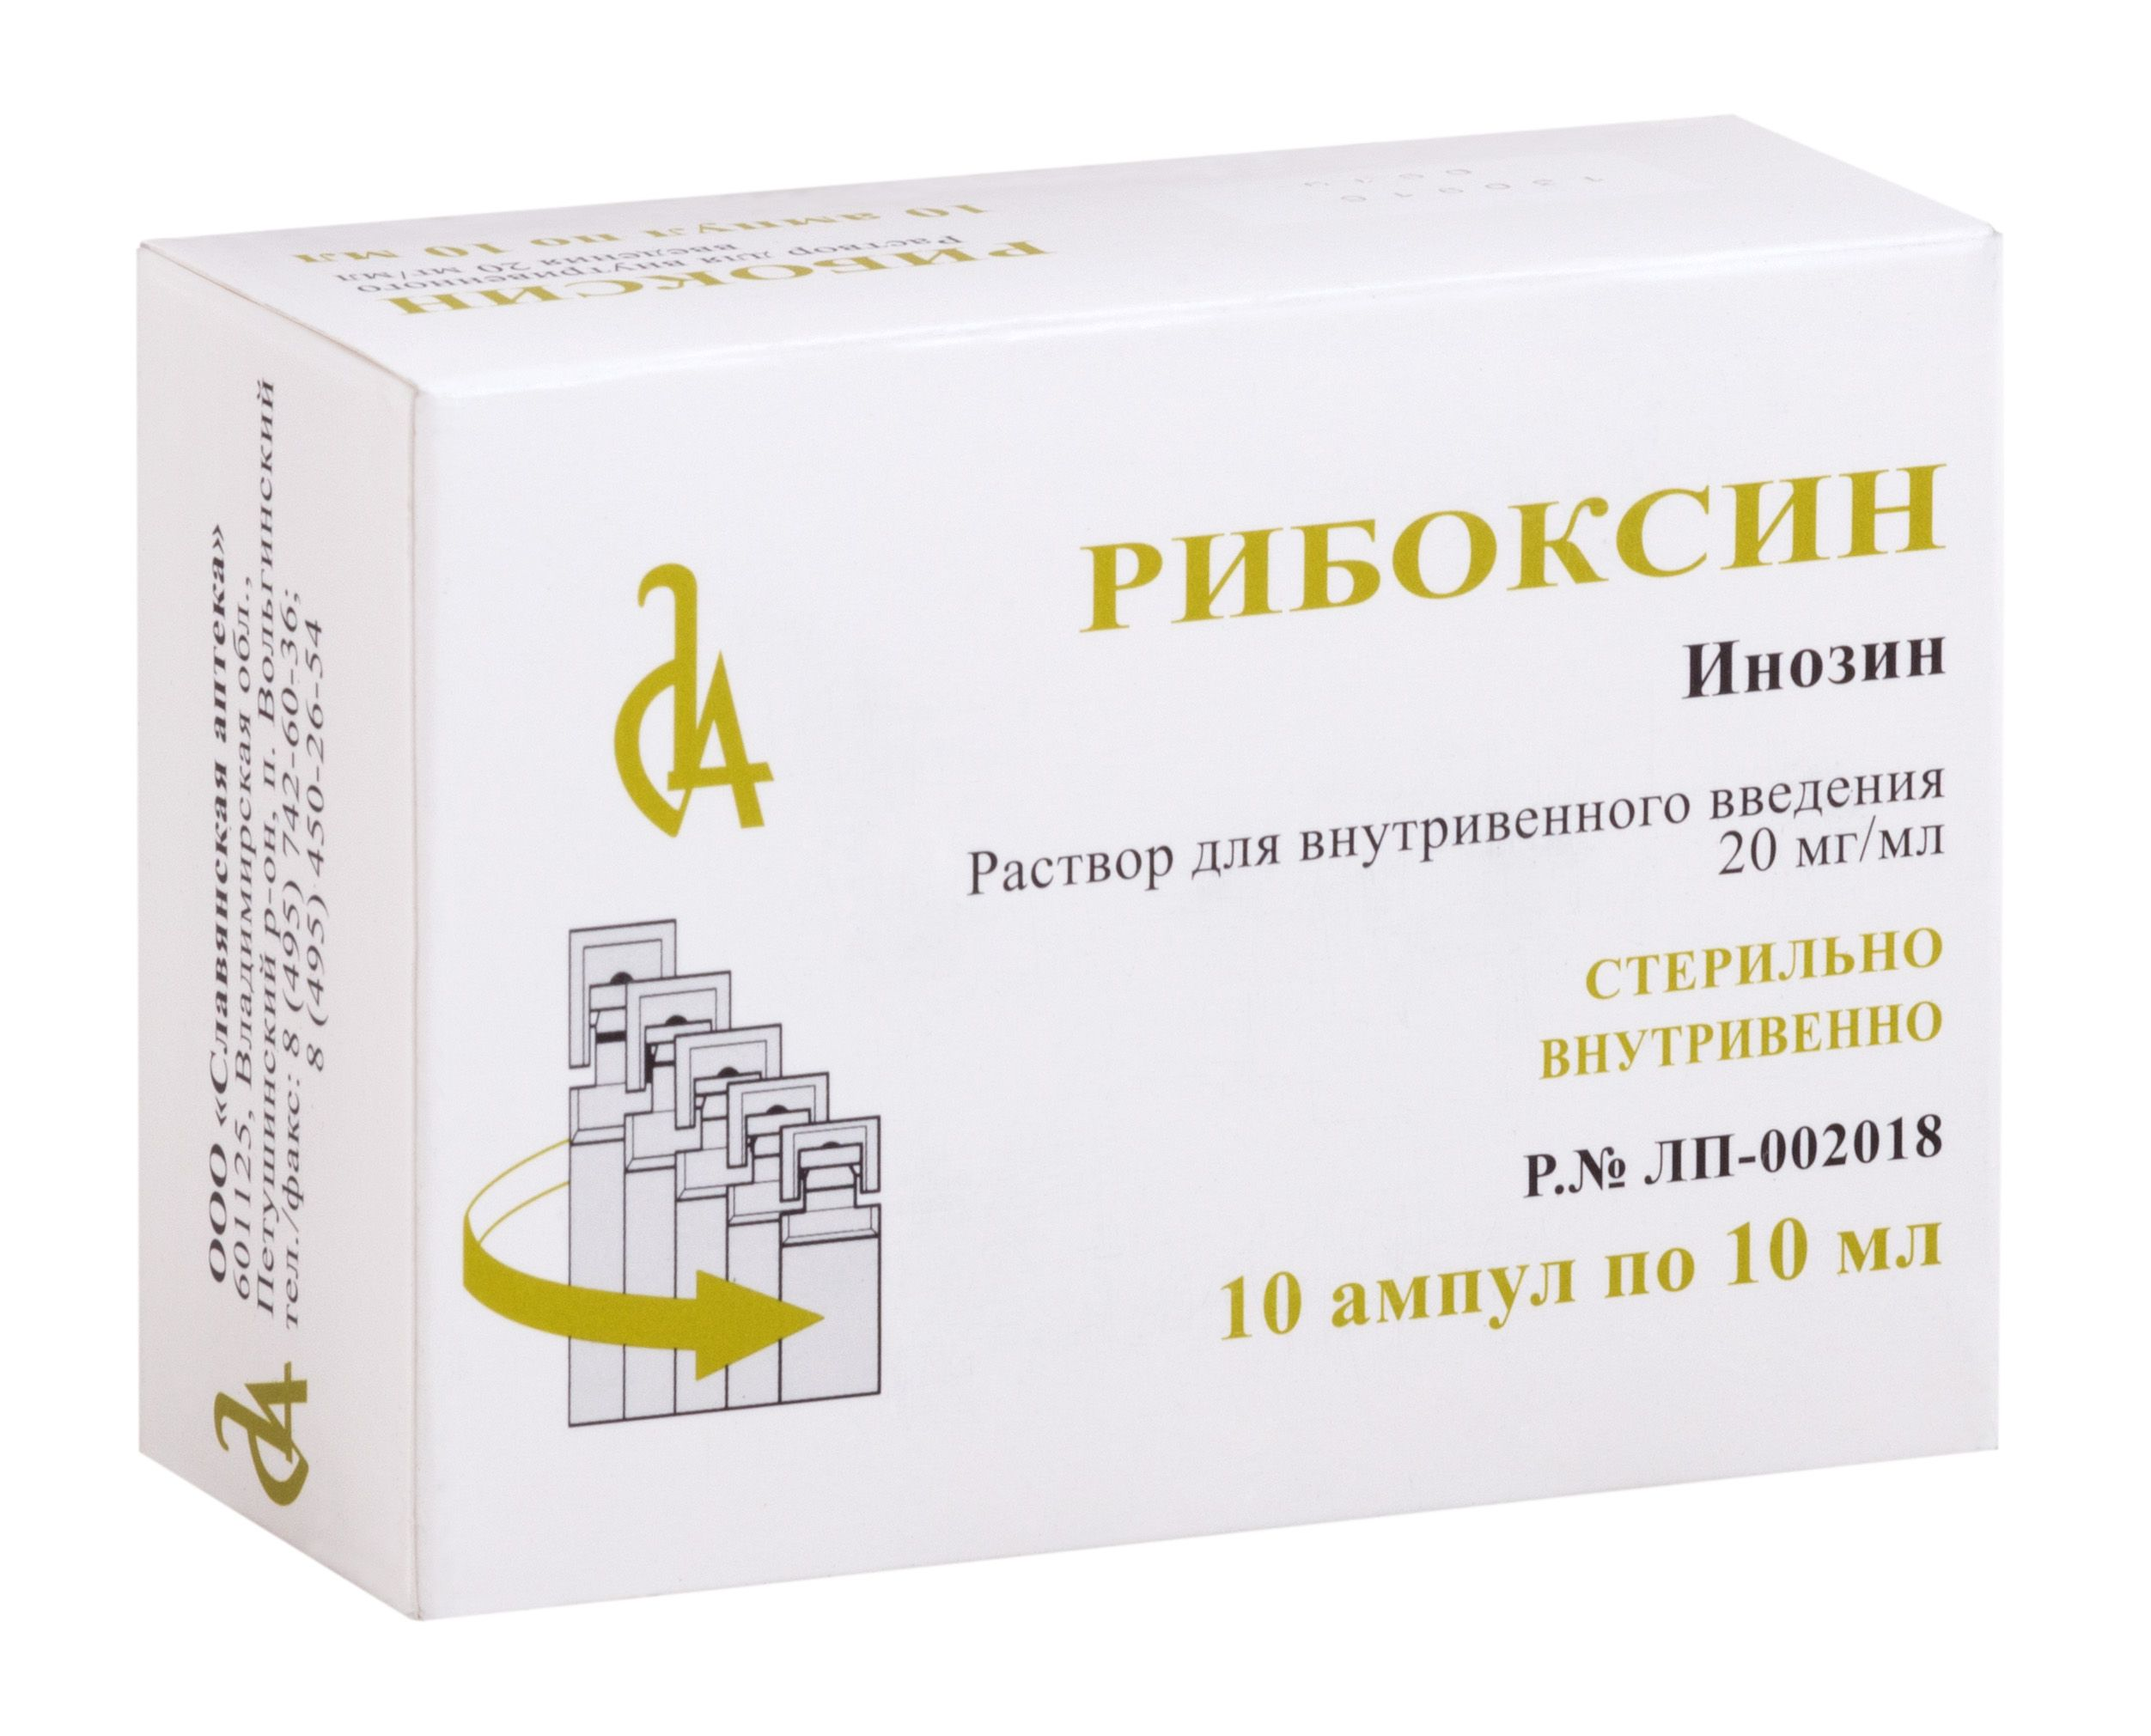 Рибоксин состав